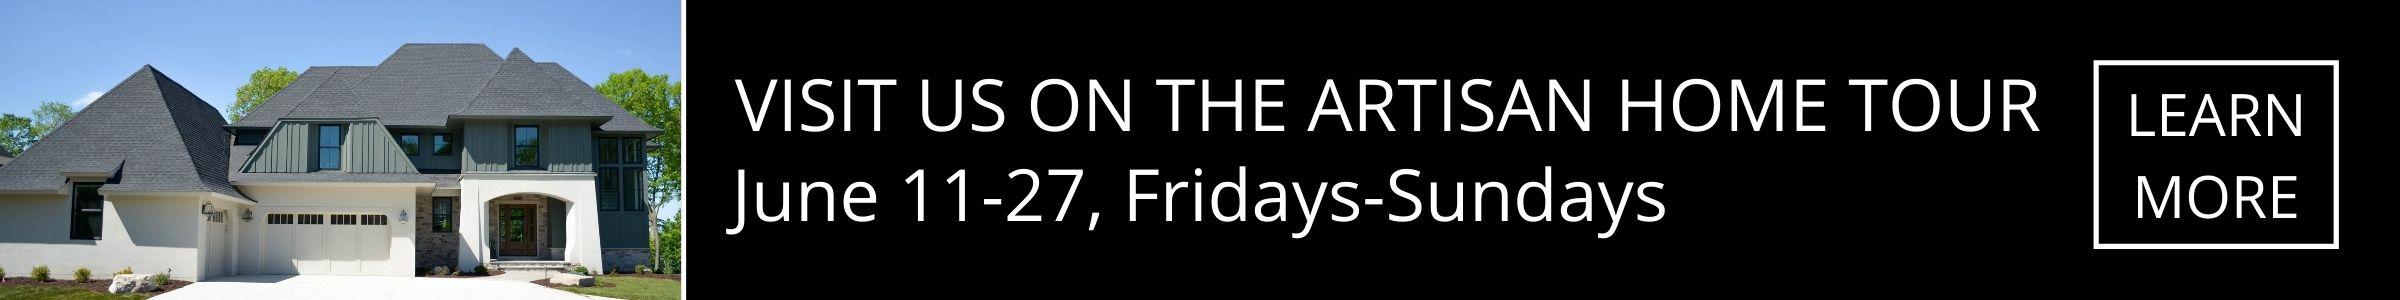 Visit Us On The Artisan Home Tour 2